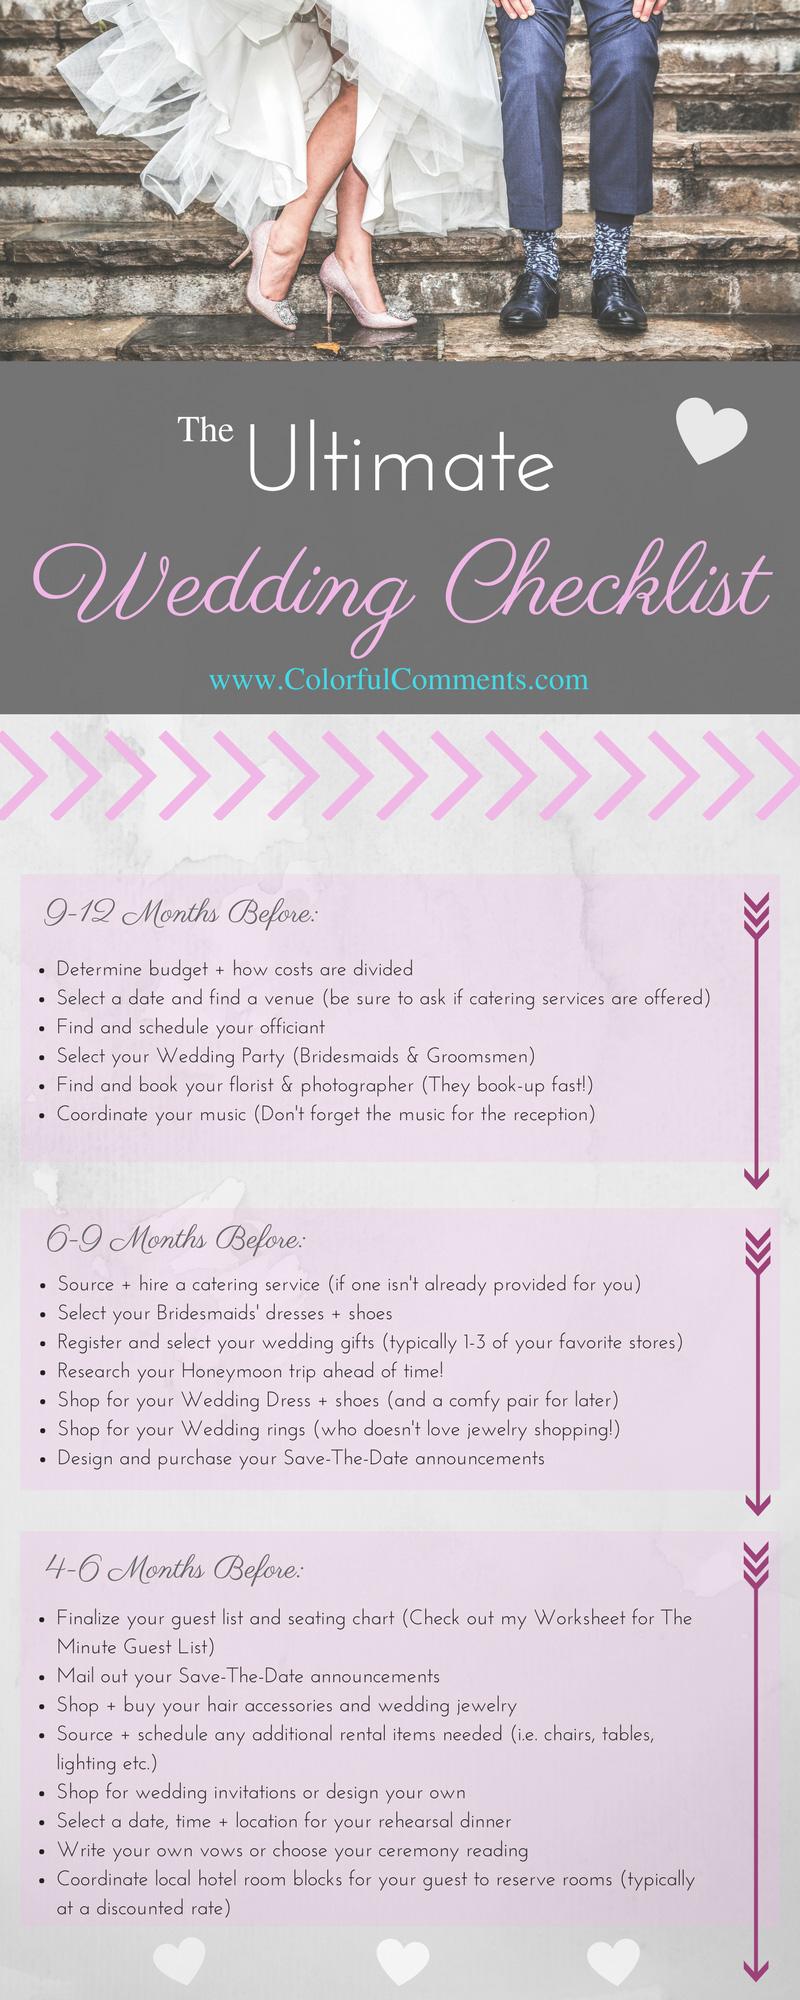 The Ultimate Wedding Checklist-PG1-071717_edited2.jpg